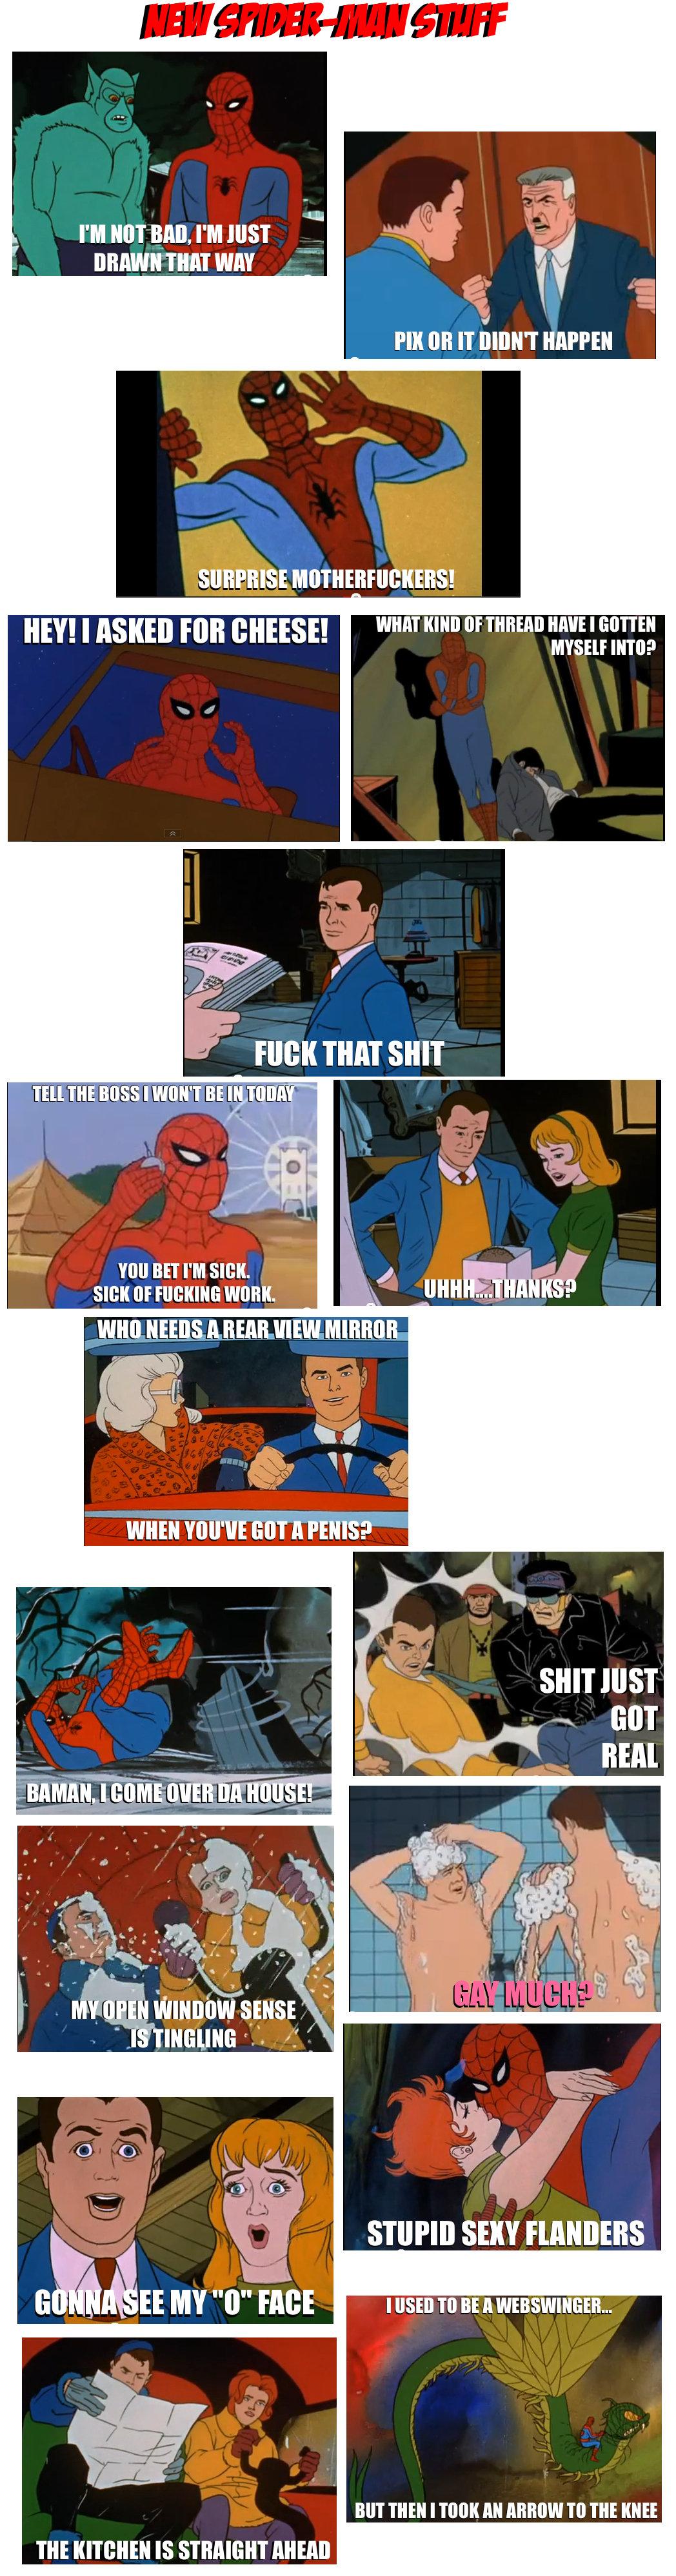 Spiderman Meme Funny Junk : New spider man meme stuff